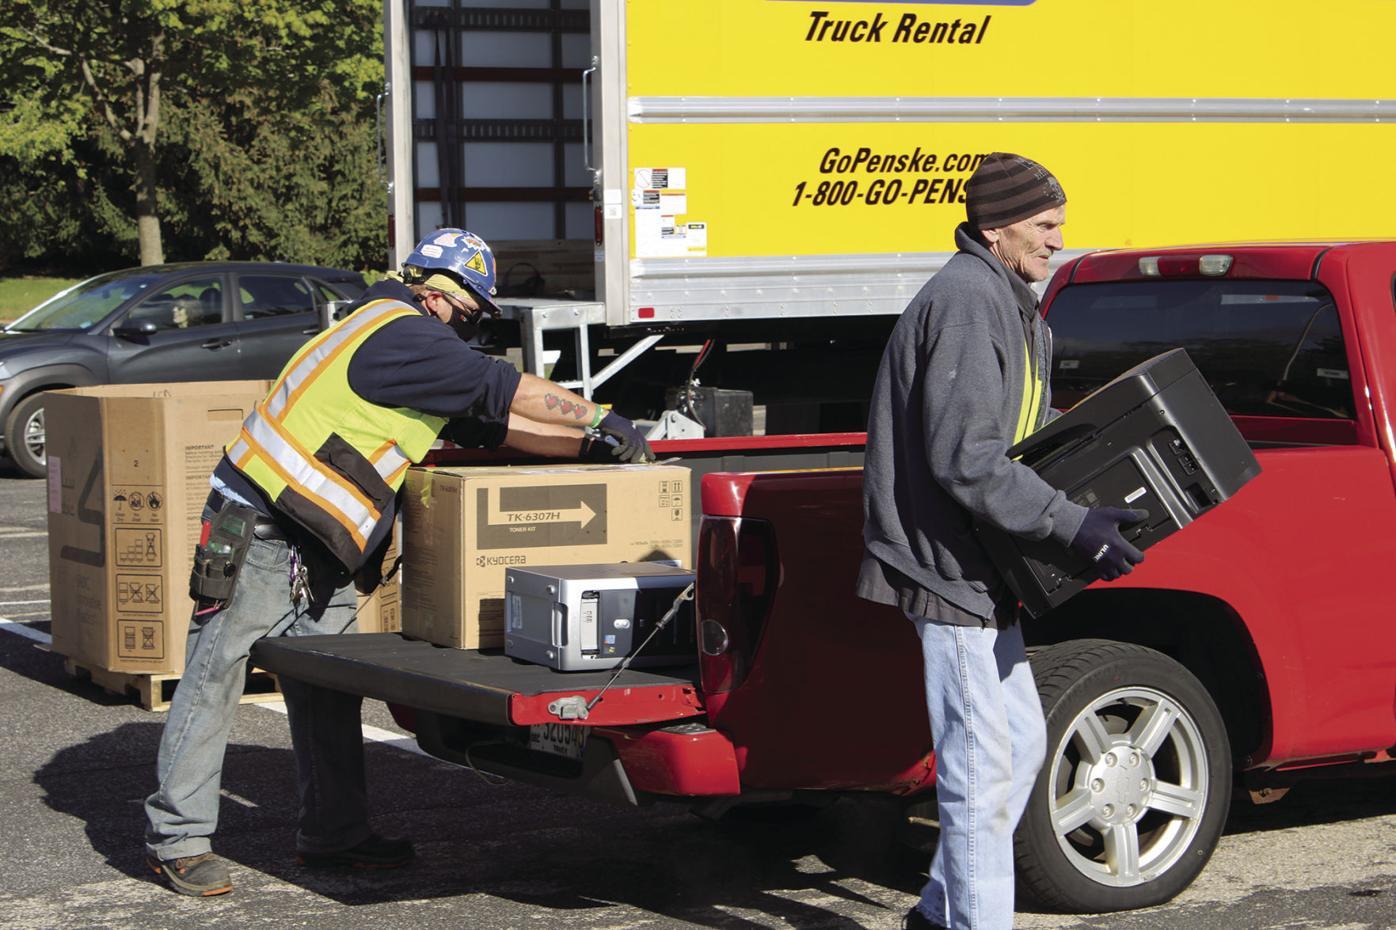 Unloading items